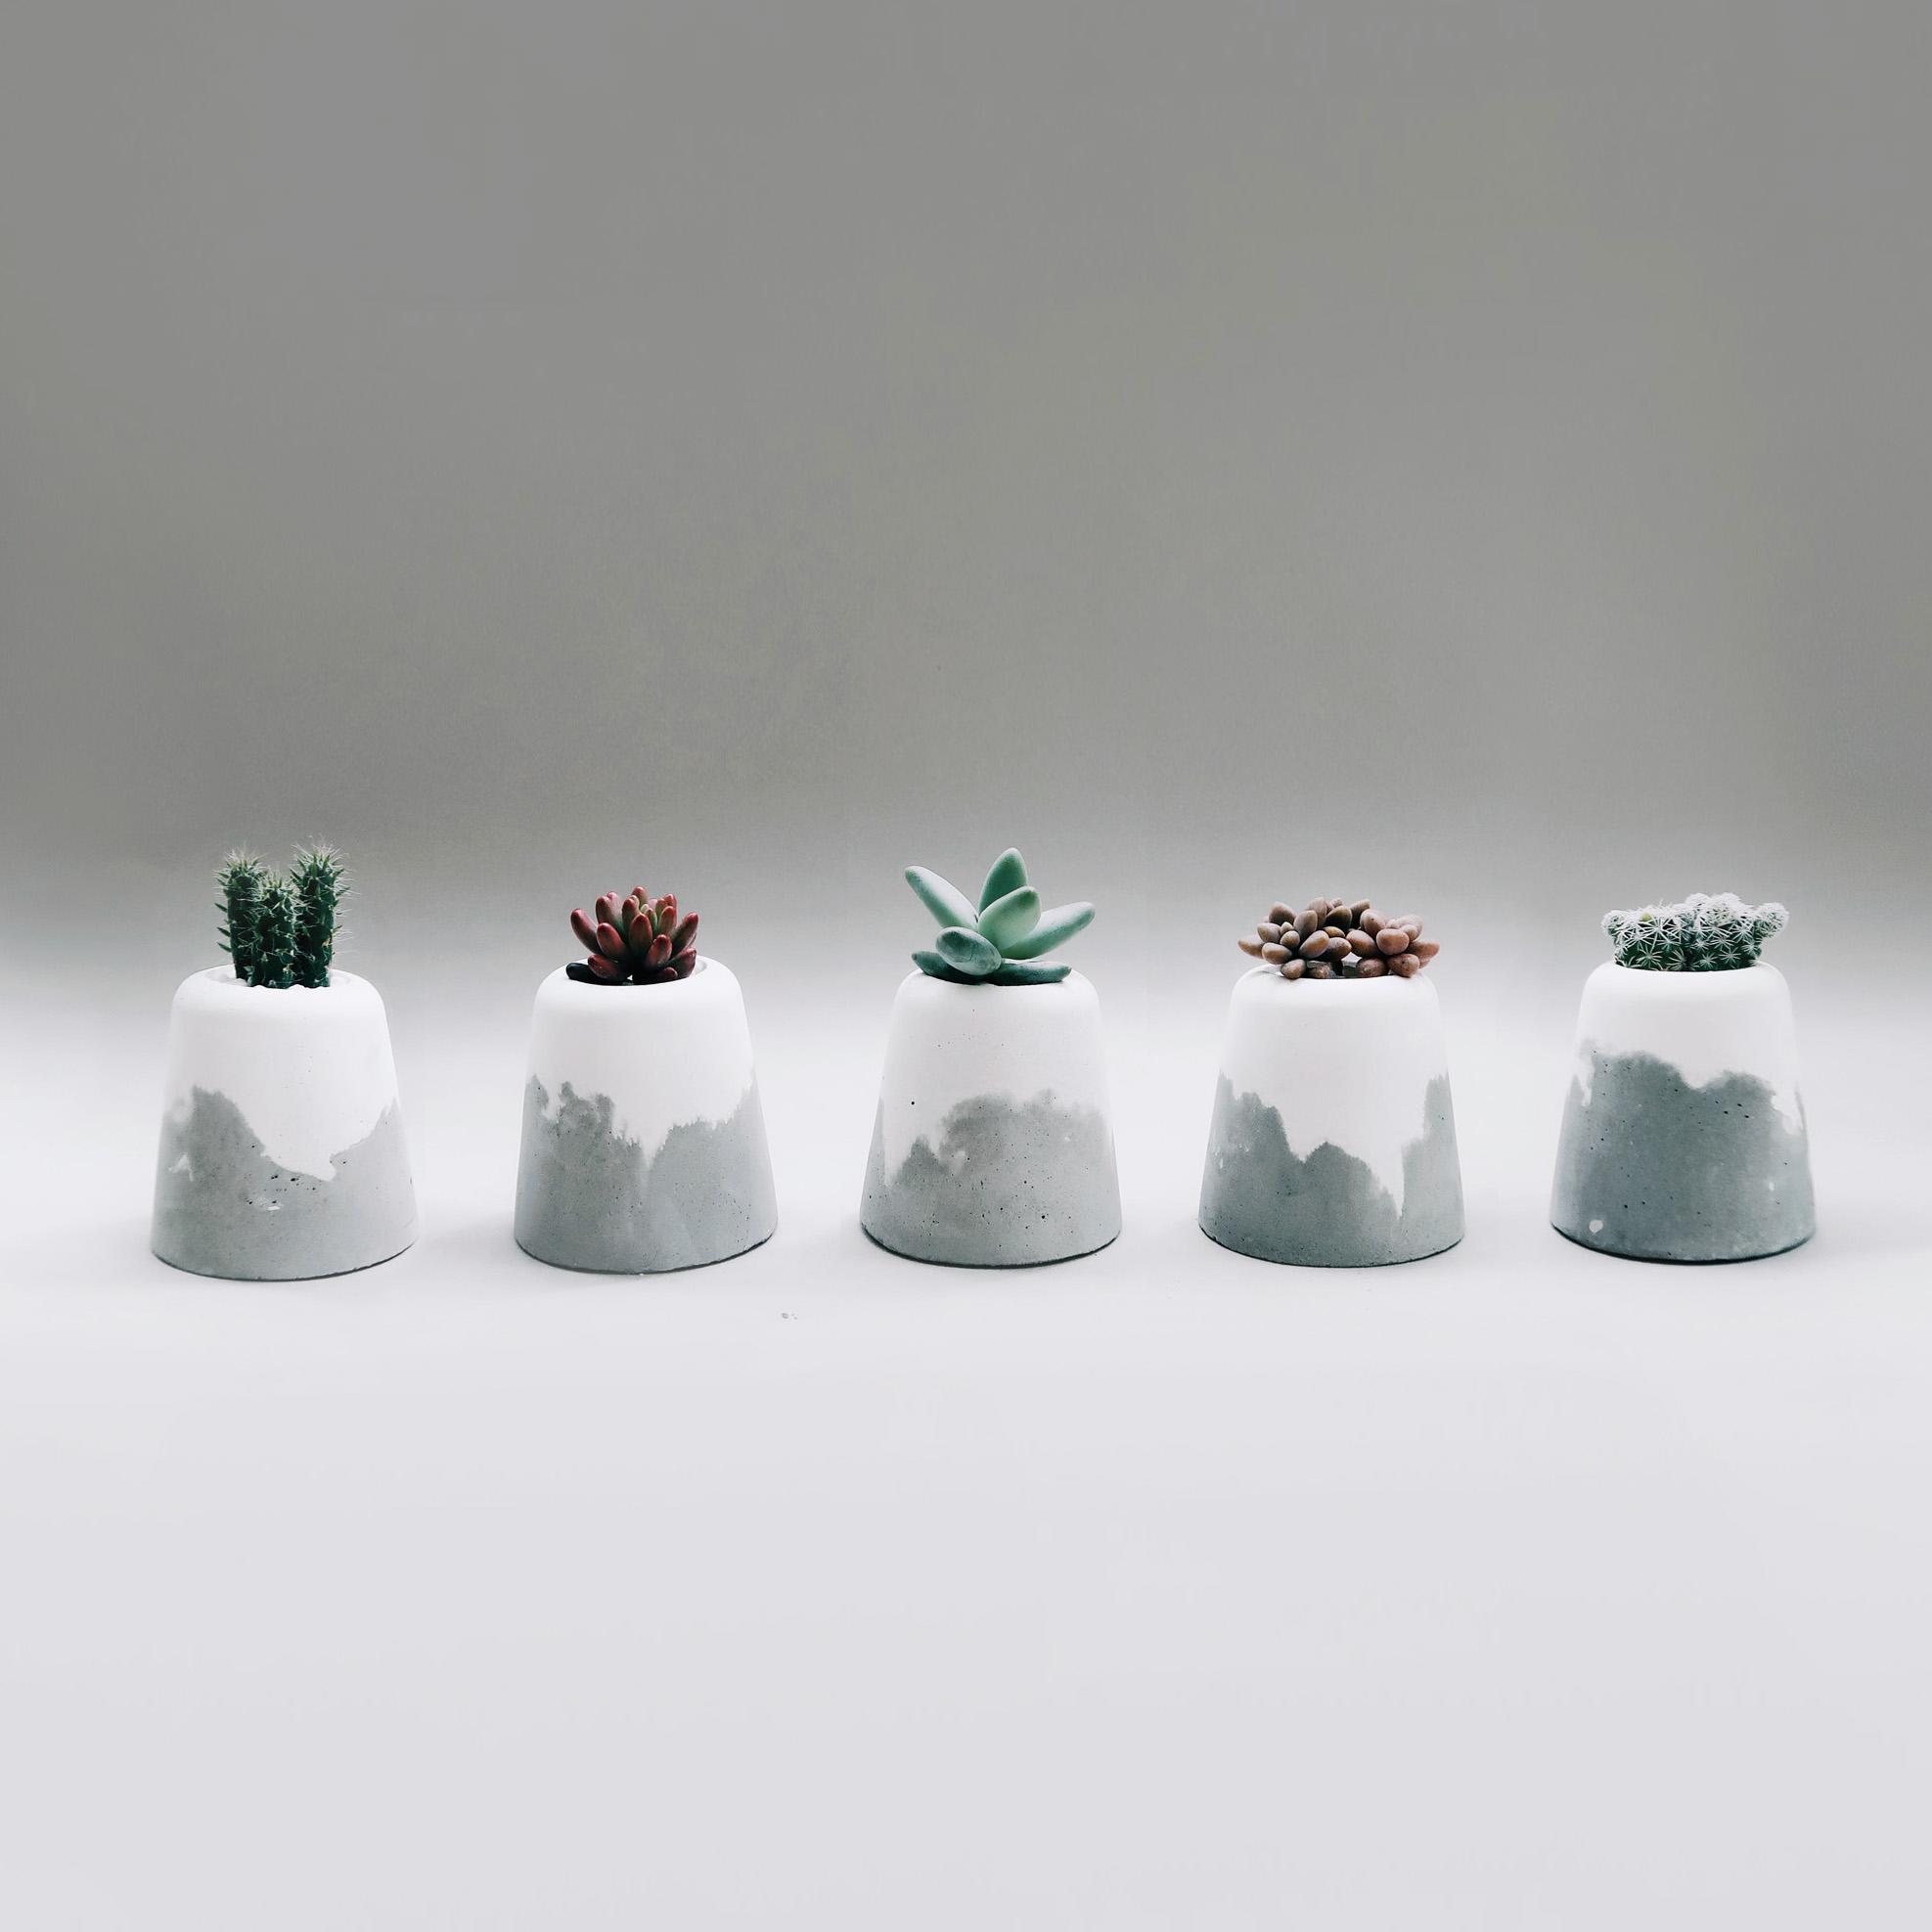 SNOW VOLCAN 小雪火山多肉・仙人掌・空氣鳳梨水泥盆栽 / Succulent Concrete planter